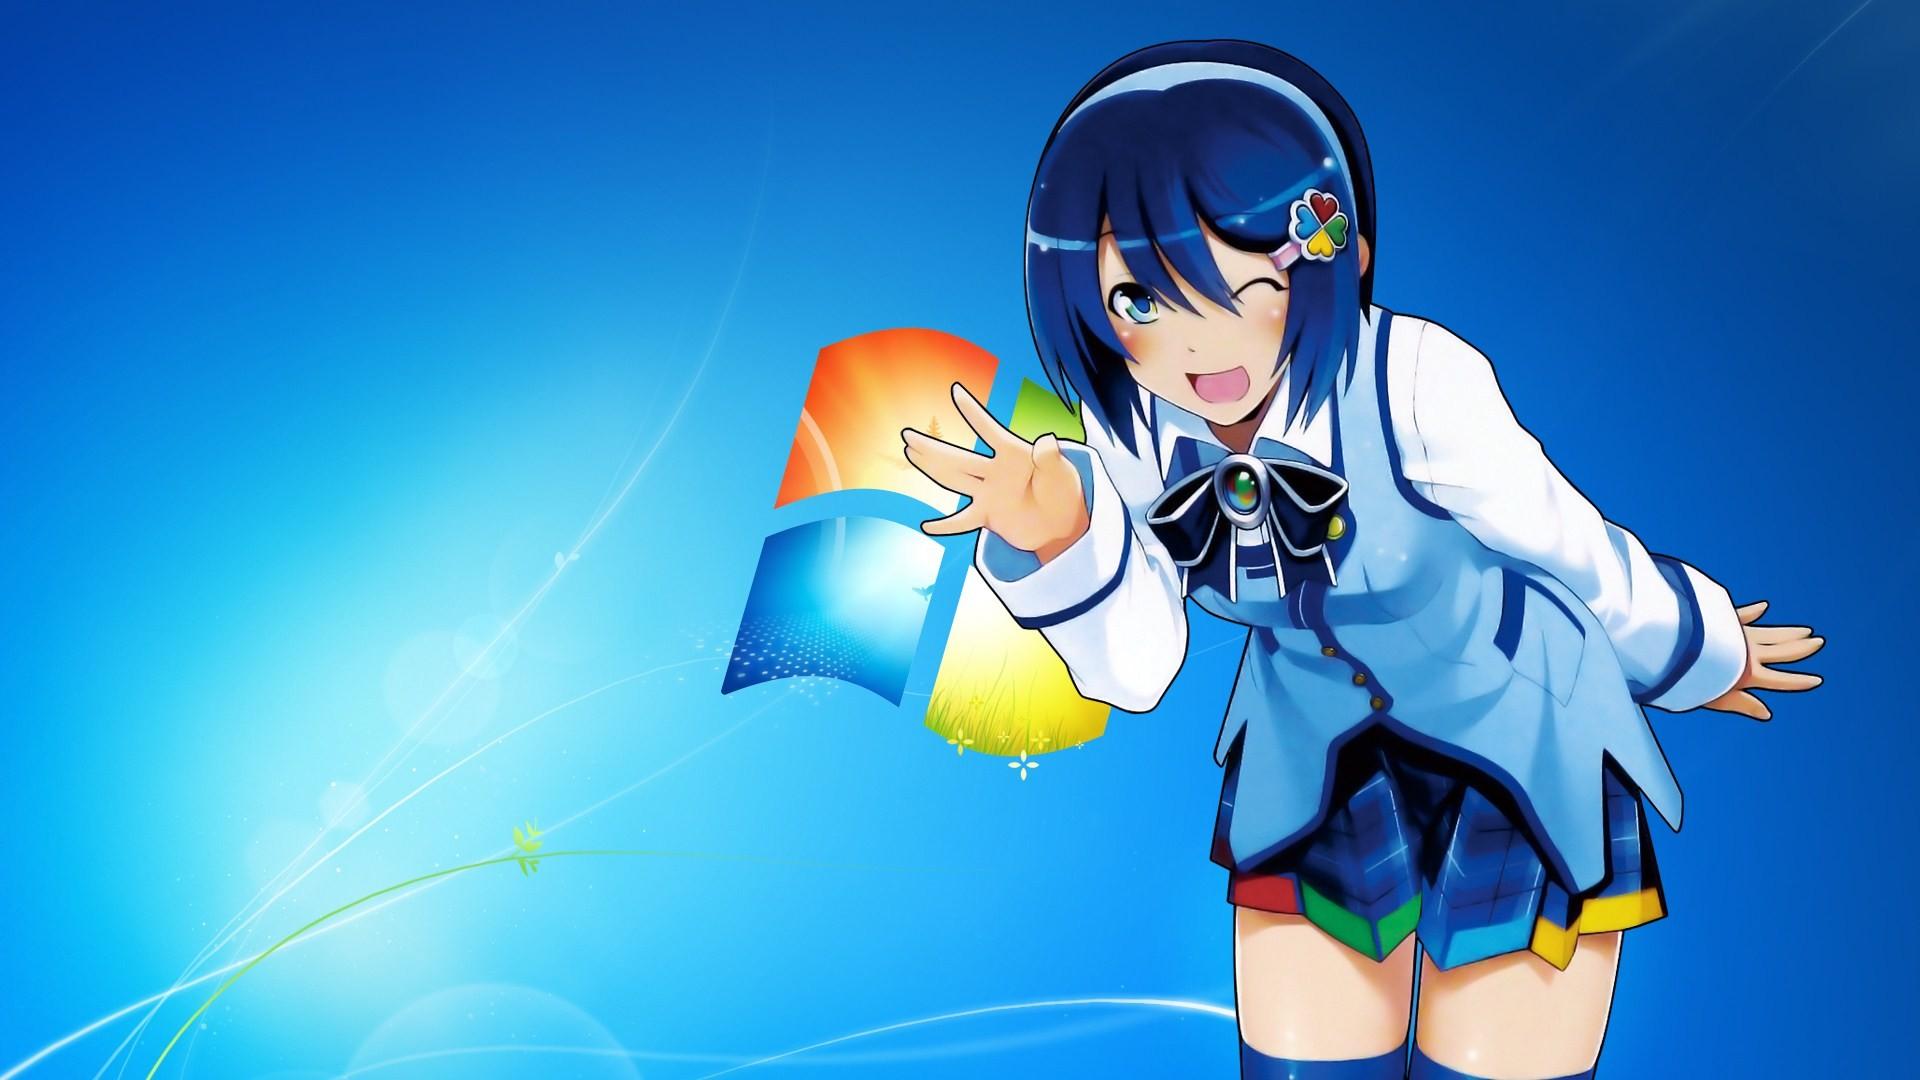 Windows 10 Wallpaper Anime 63 Images